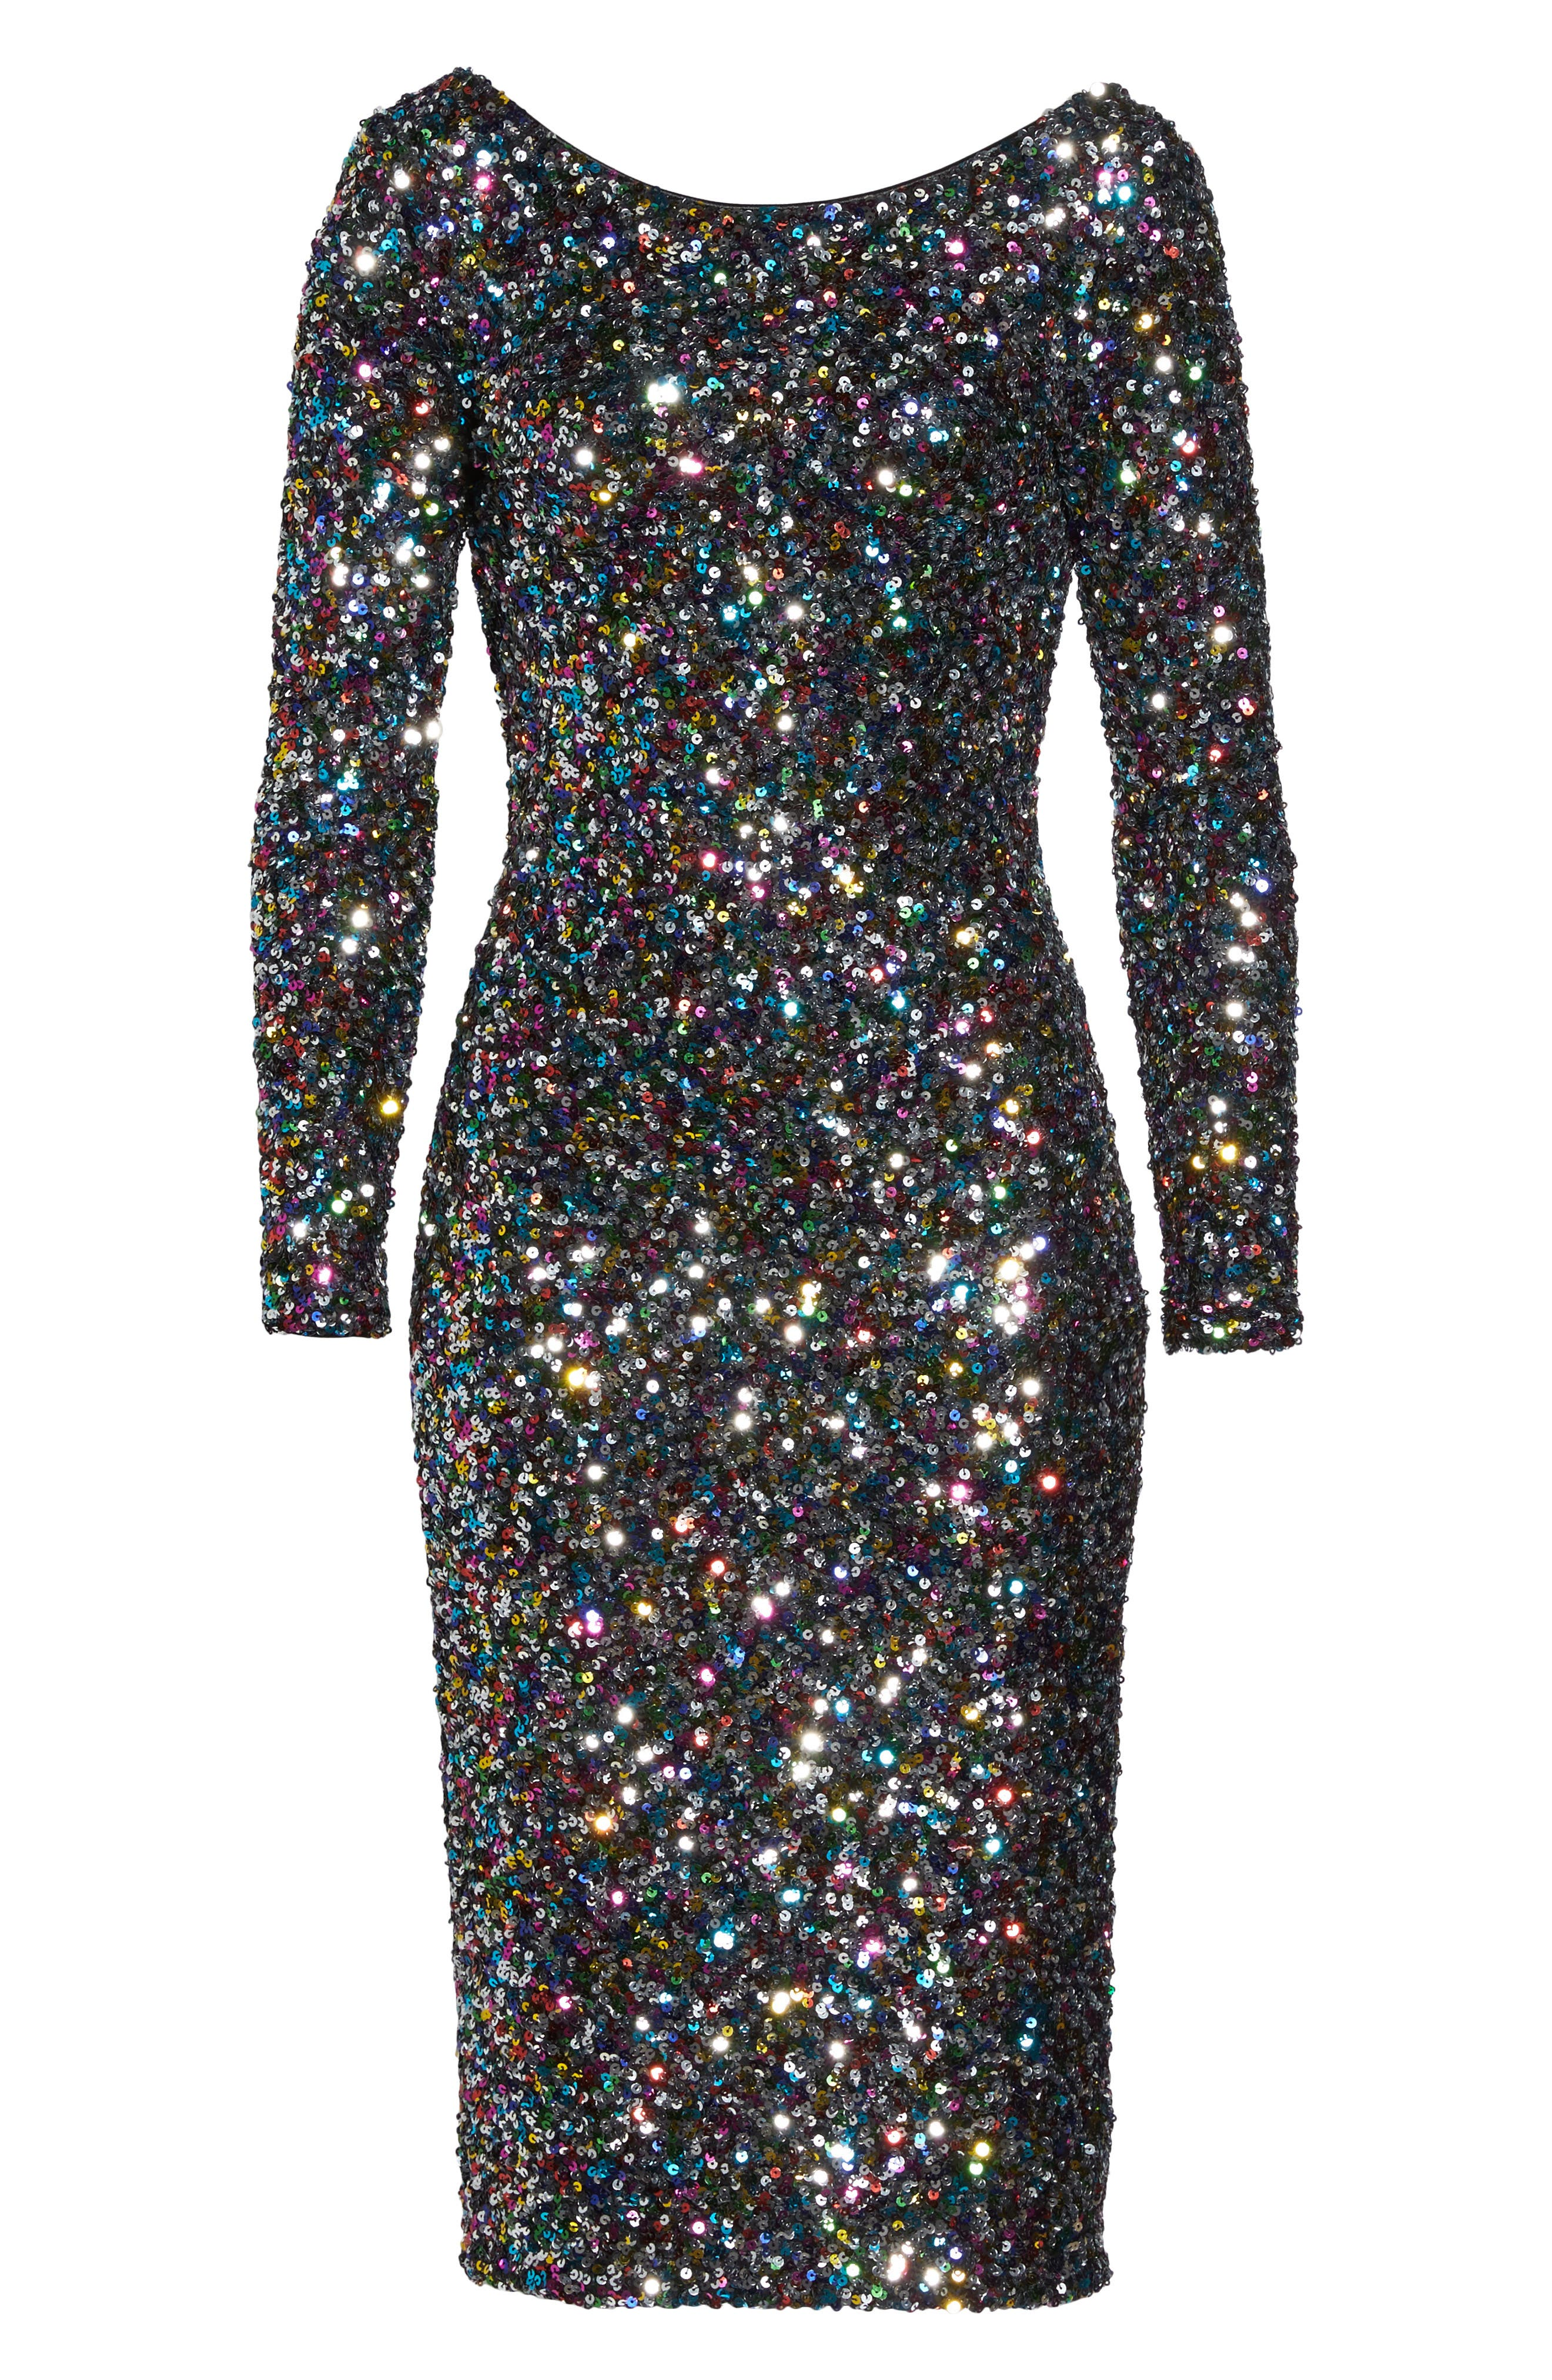 Emery Ombré Sequin Body-Con Dress,                             Alternate thumbnail 27, color,